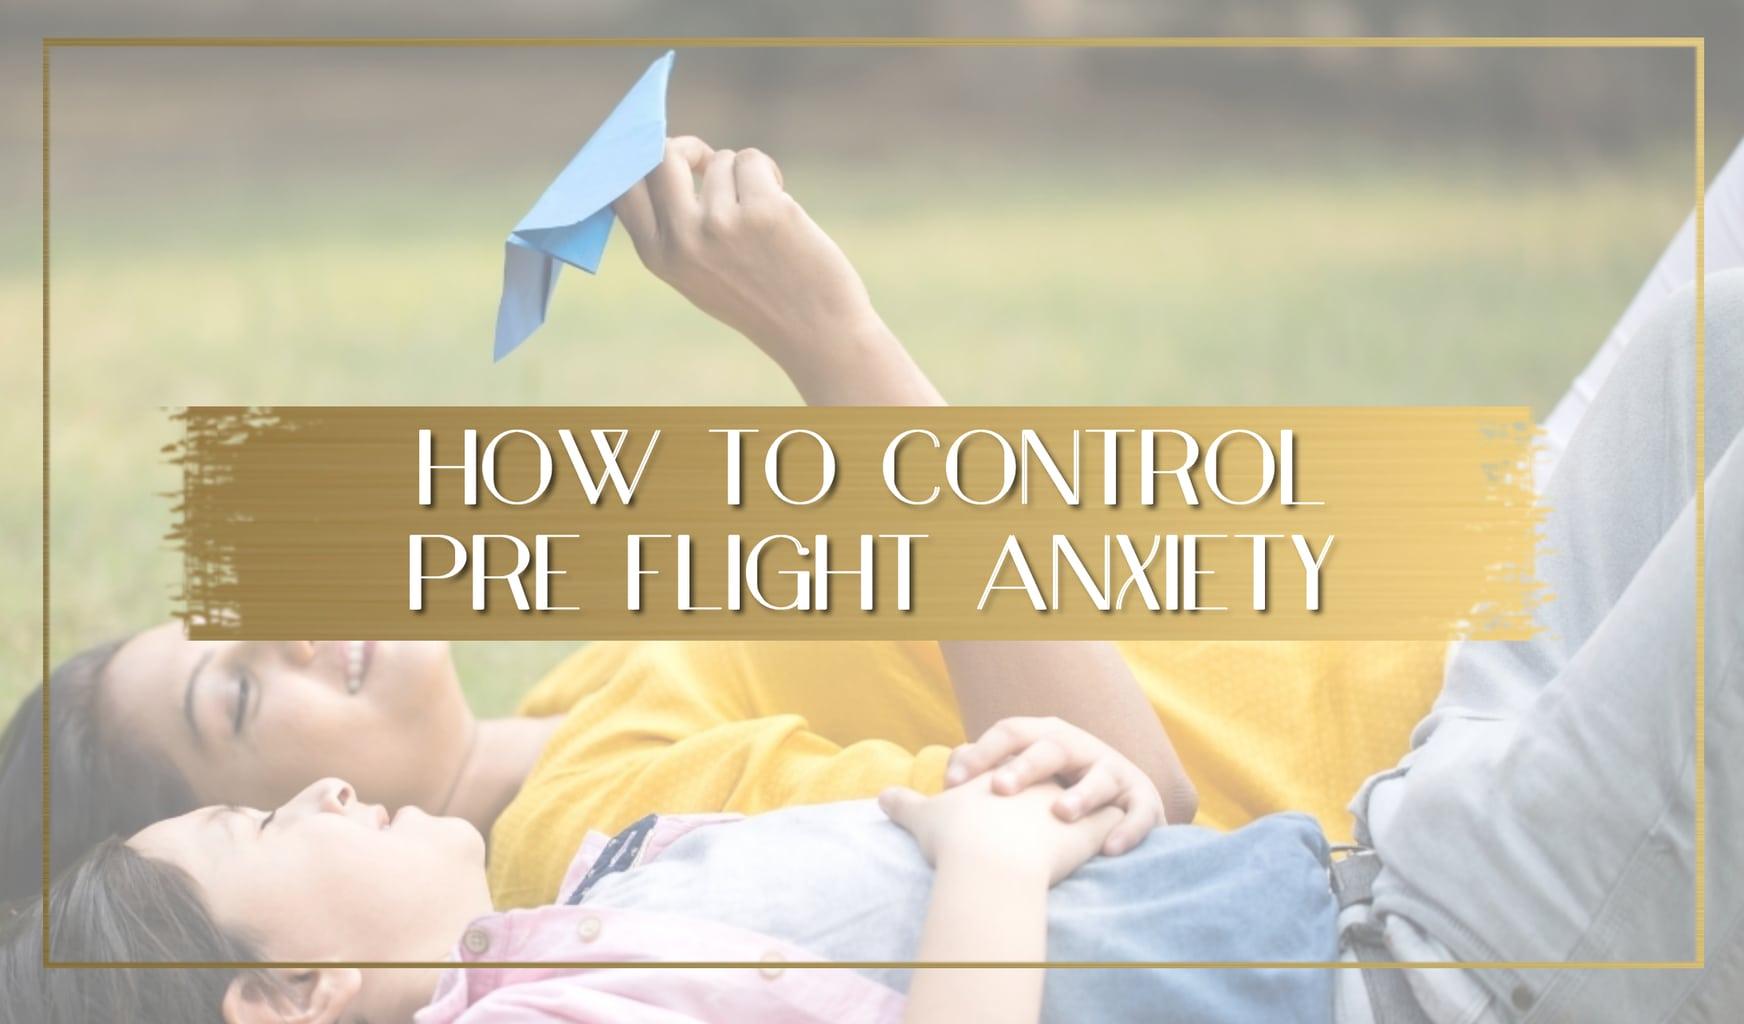 Controling pre-flight anxiety main